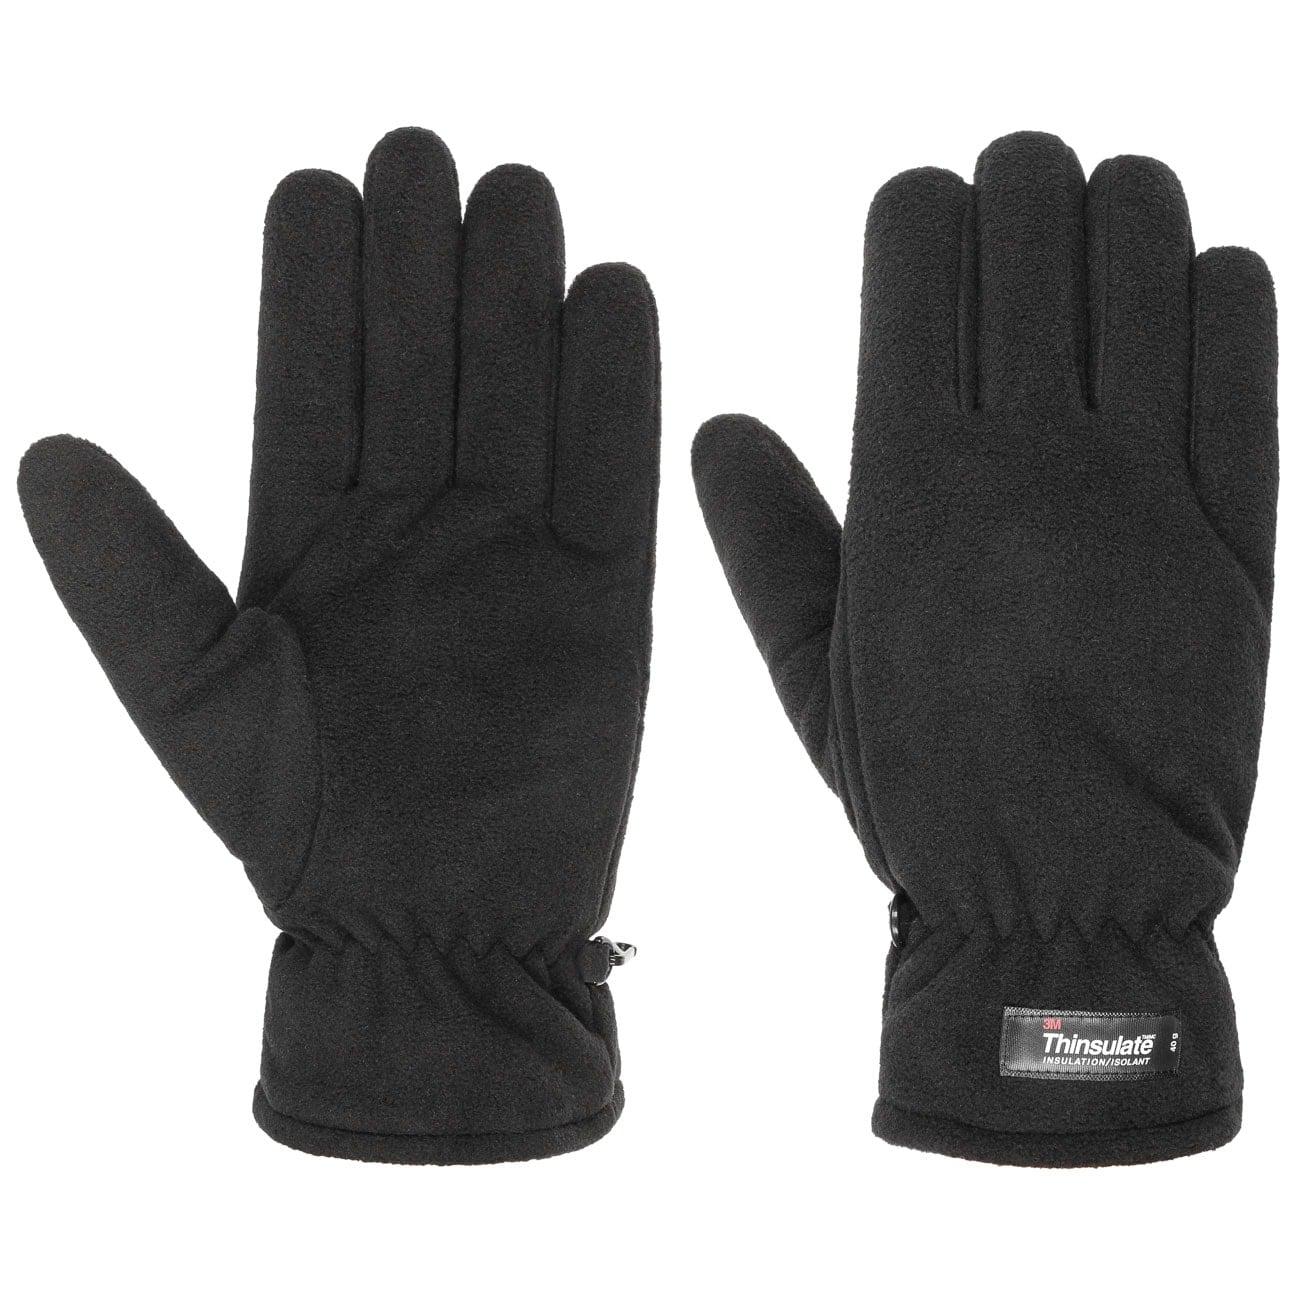 Guantes de Polar Thinsulate by Lipodo  guantes de mujer